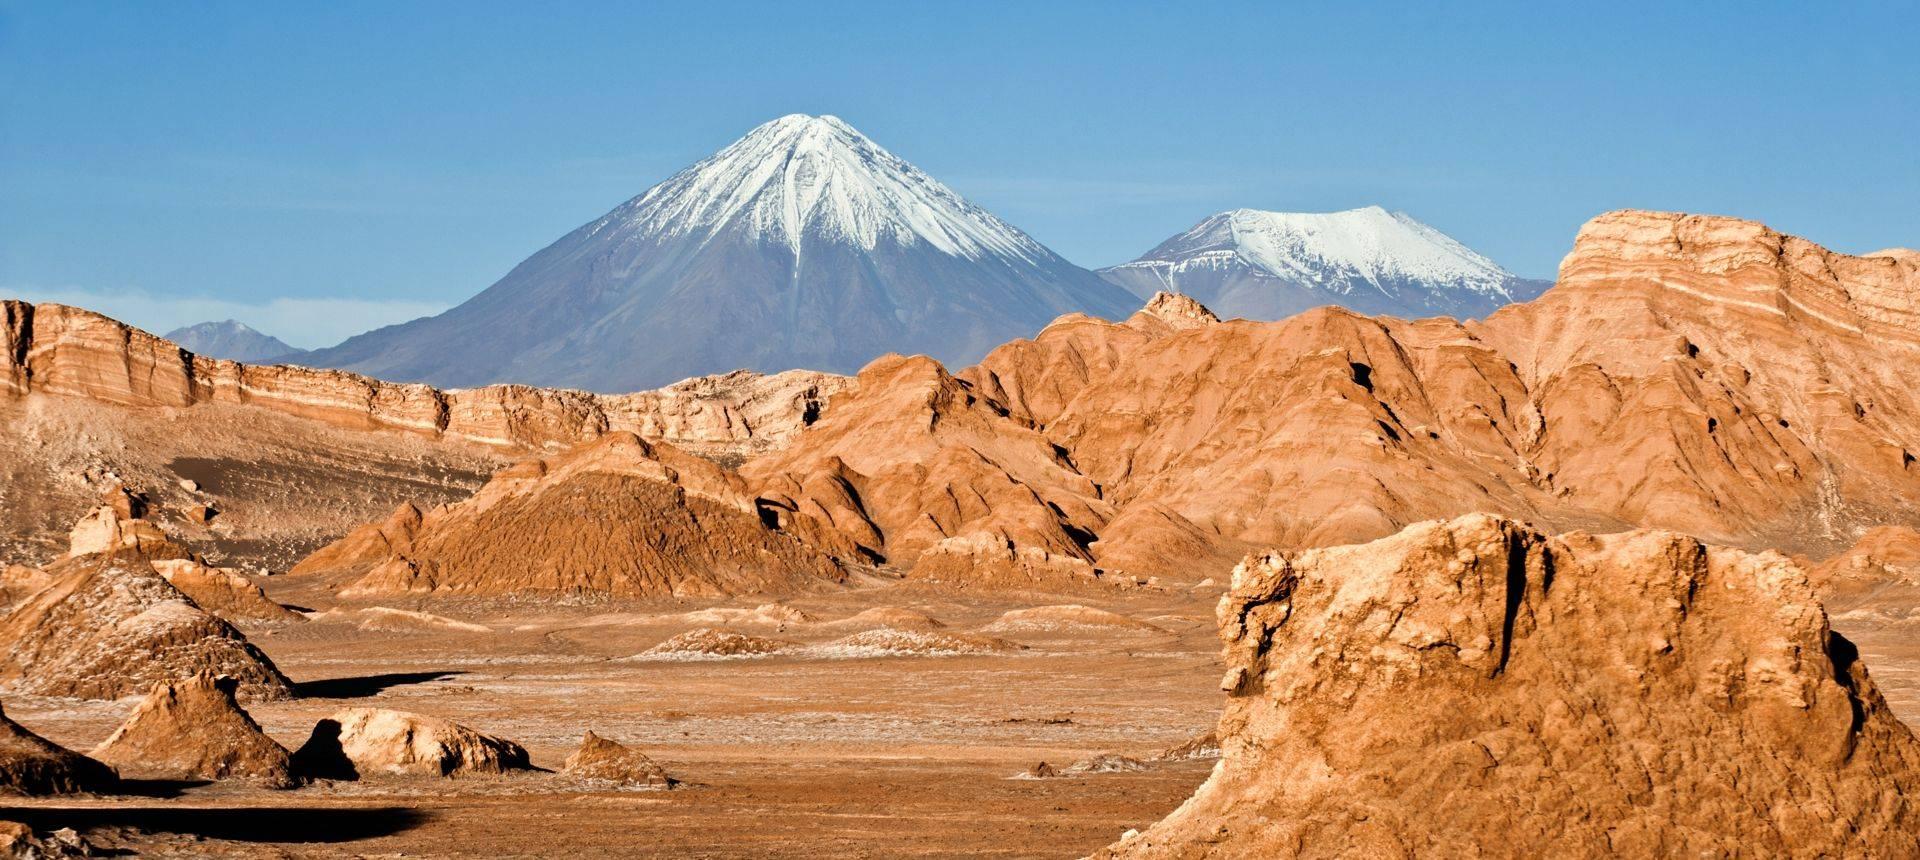 Volcanoes Licancabur And Juriques, Moon Valley, Atacama, Chile Shutterstock 109035803